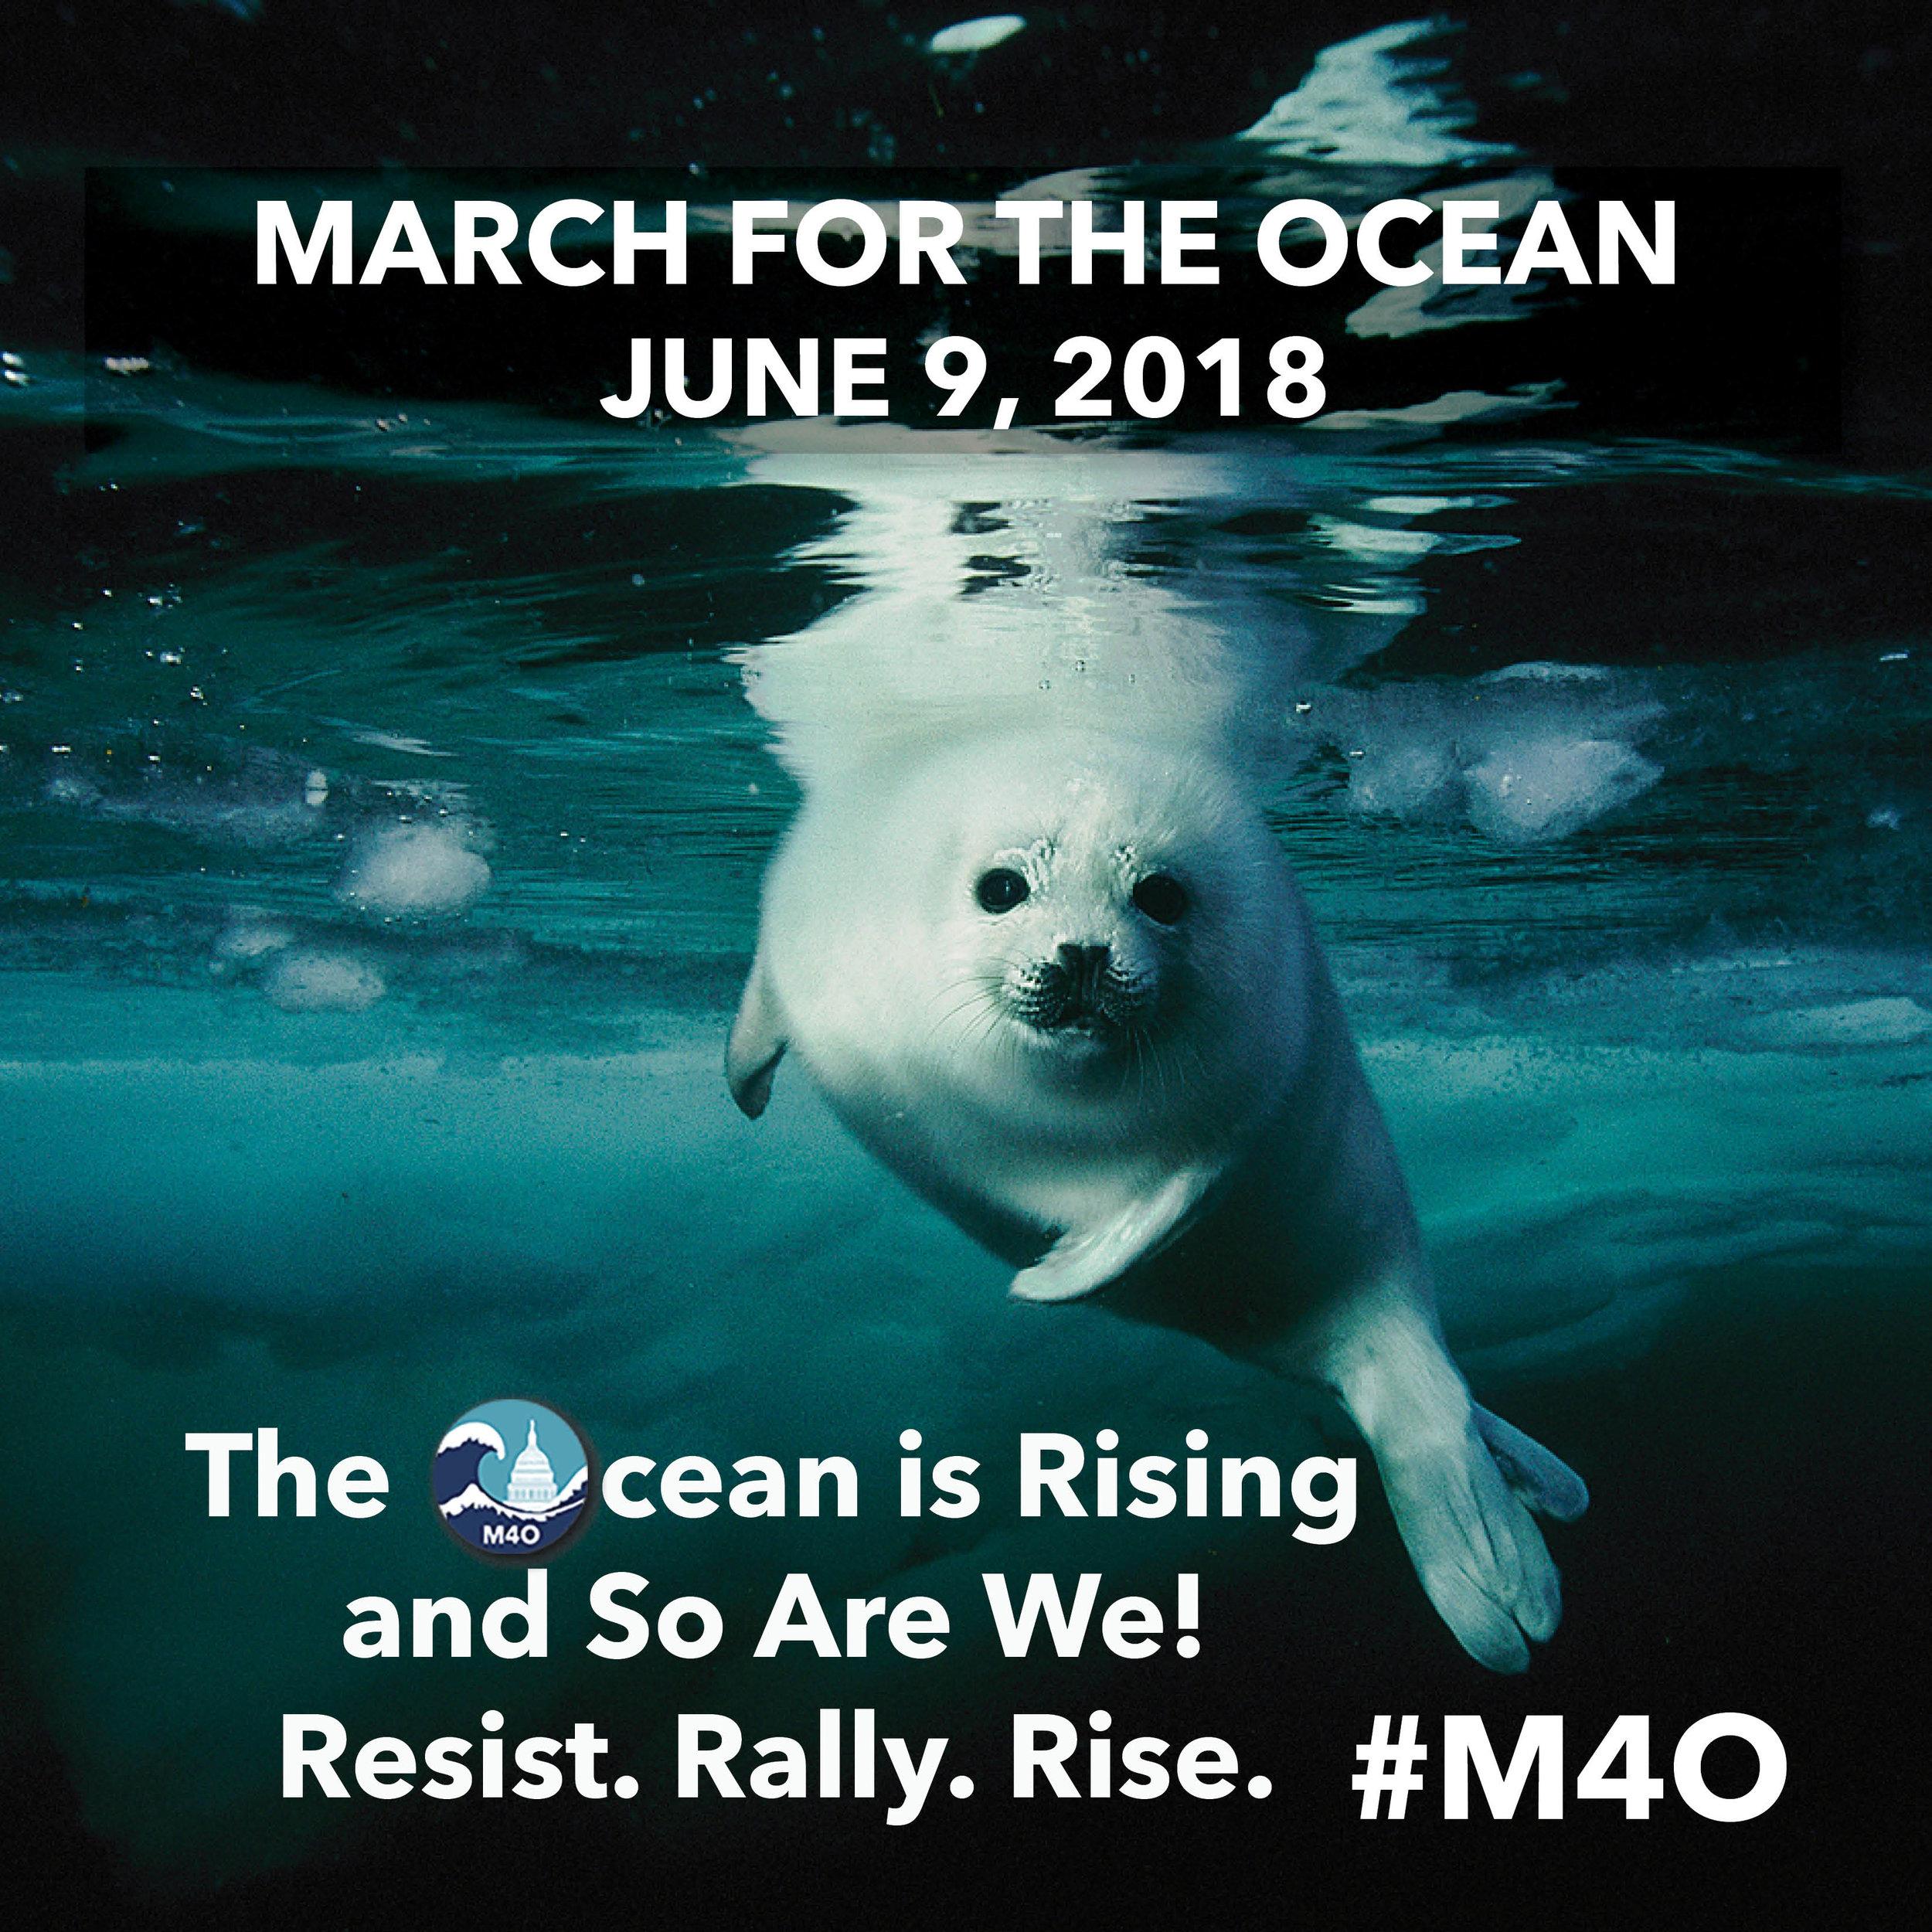 #TheOceanIsRising #AndSoAreWe